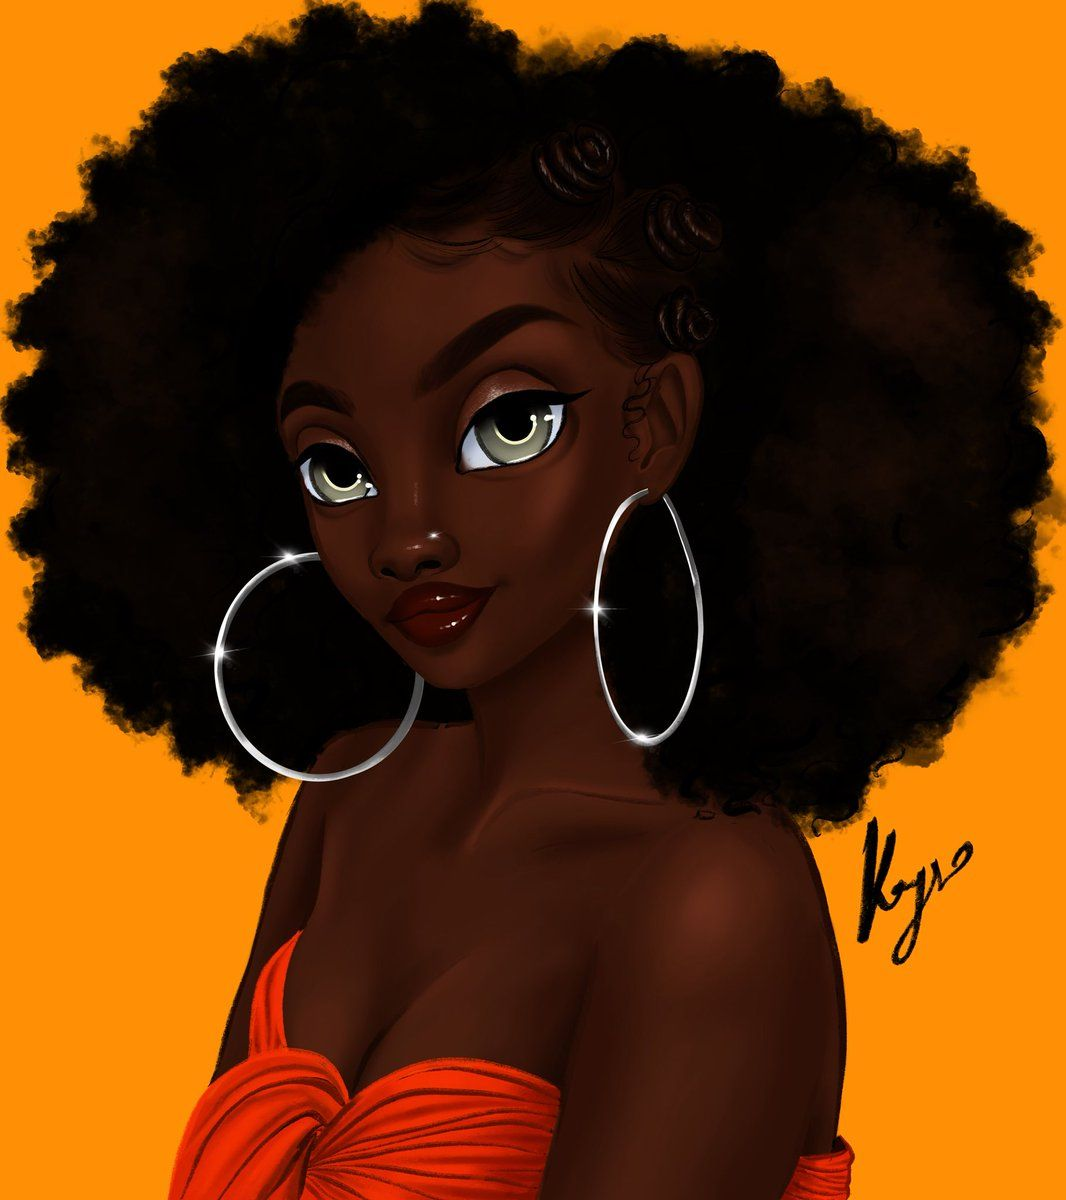 Cute Black Girls Cartoon Wallpapers - Wallpaper Cave